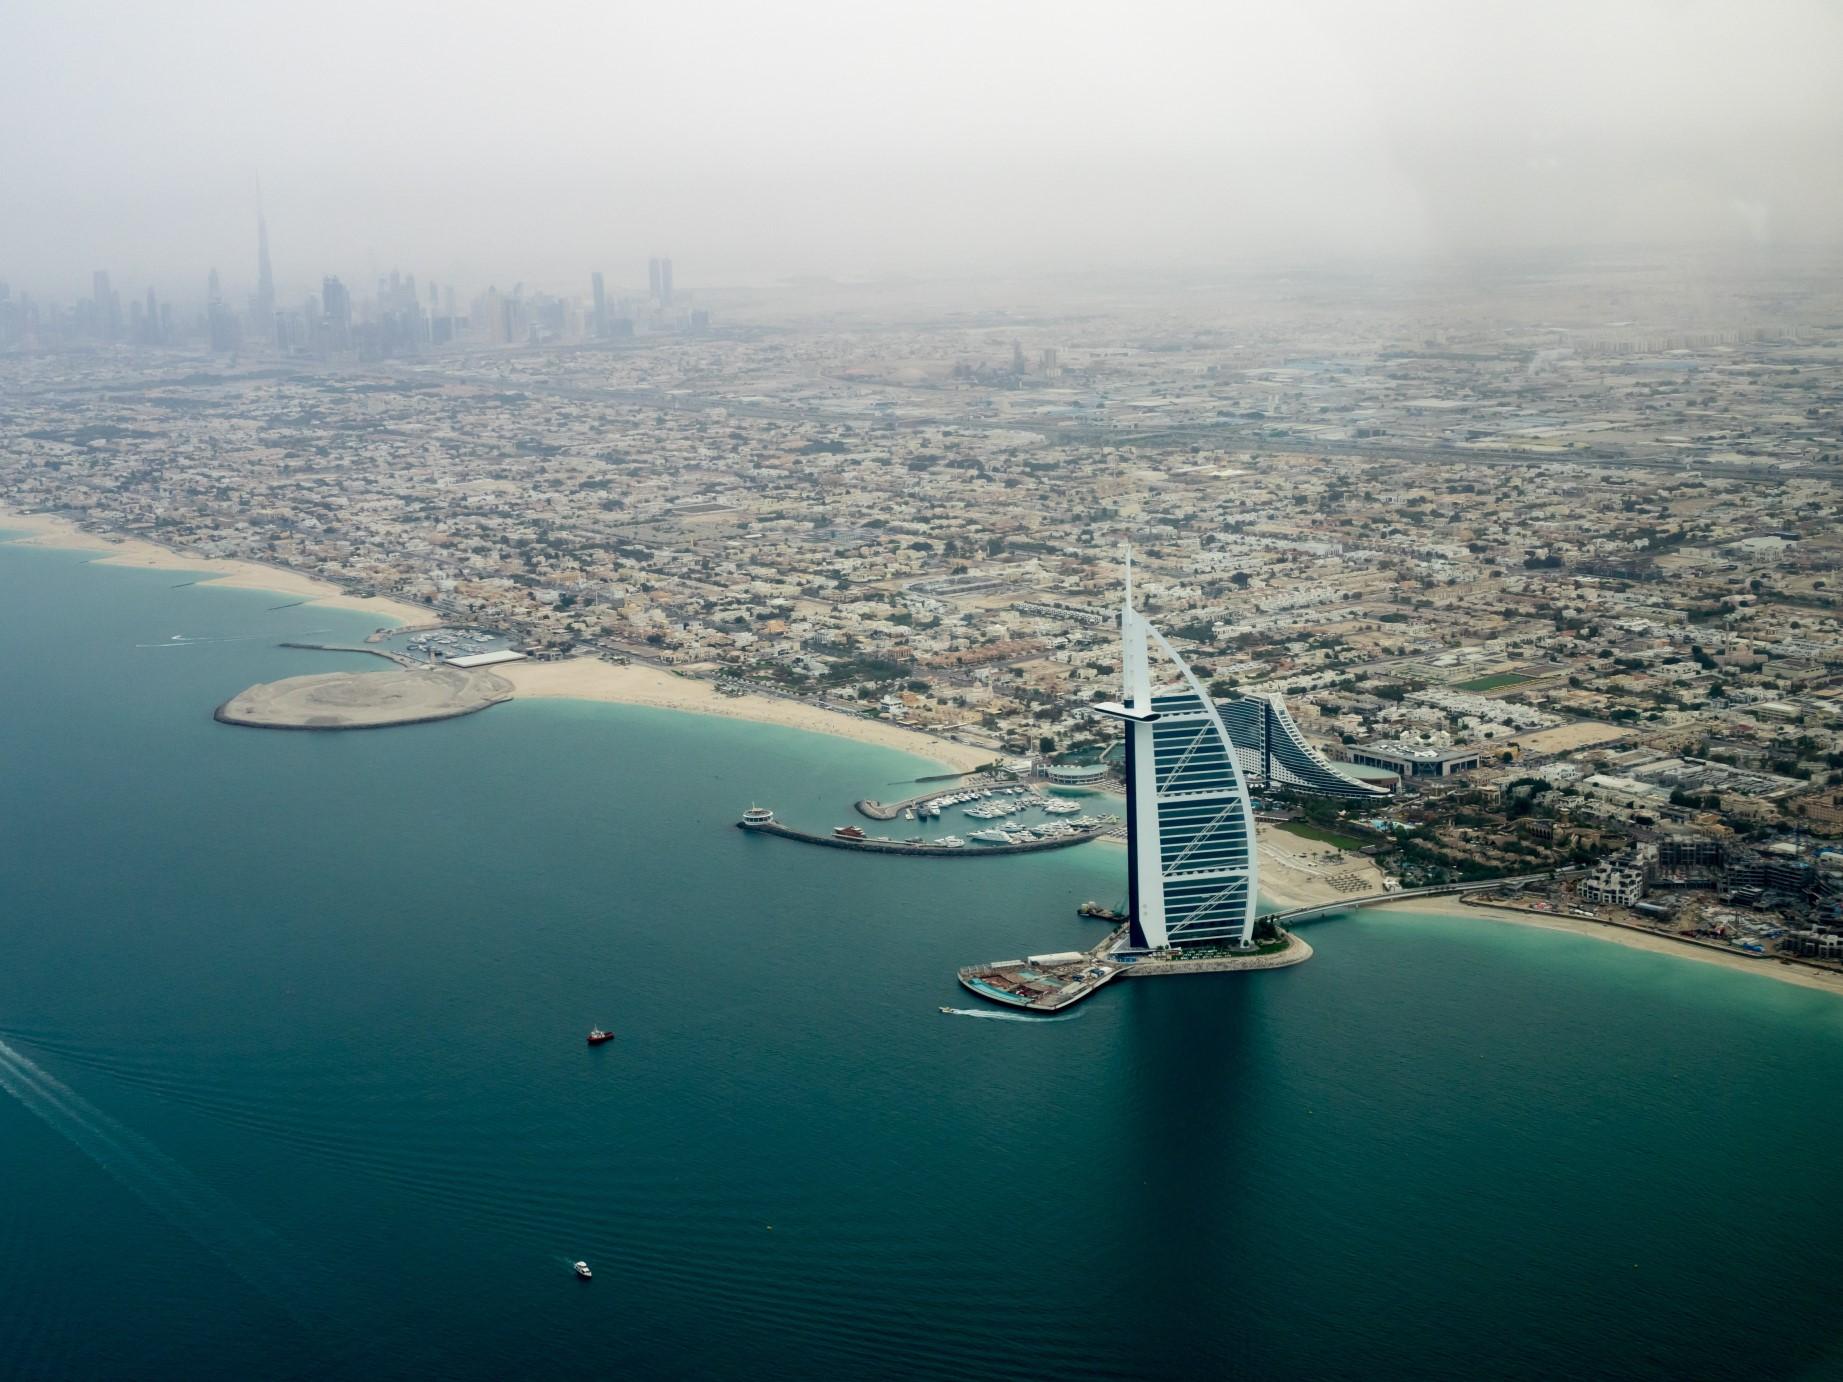 Emiratos Árabes y Arabia Saudita